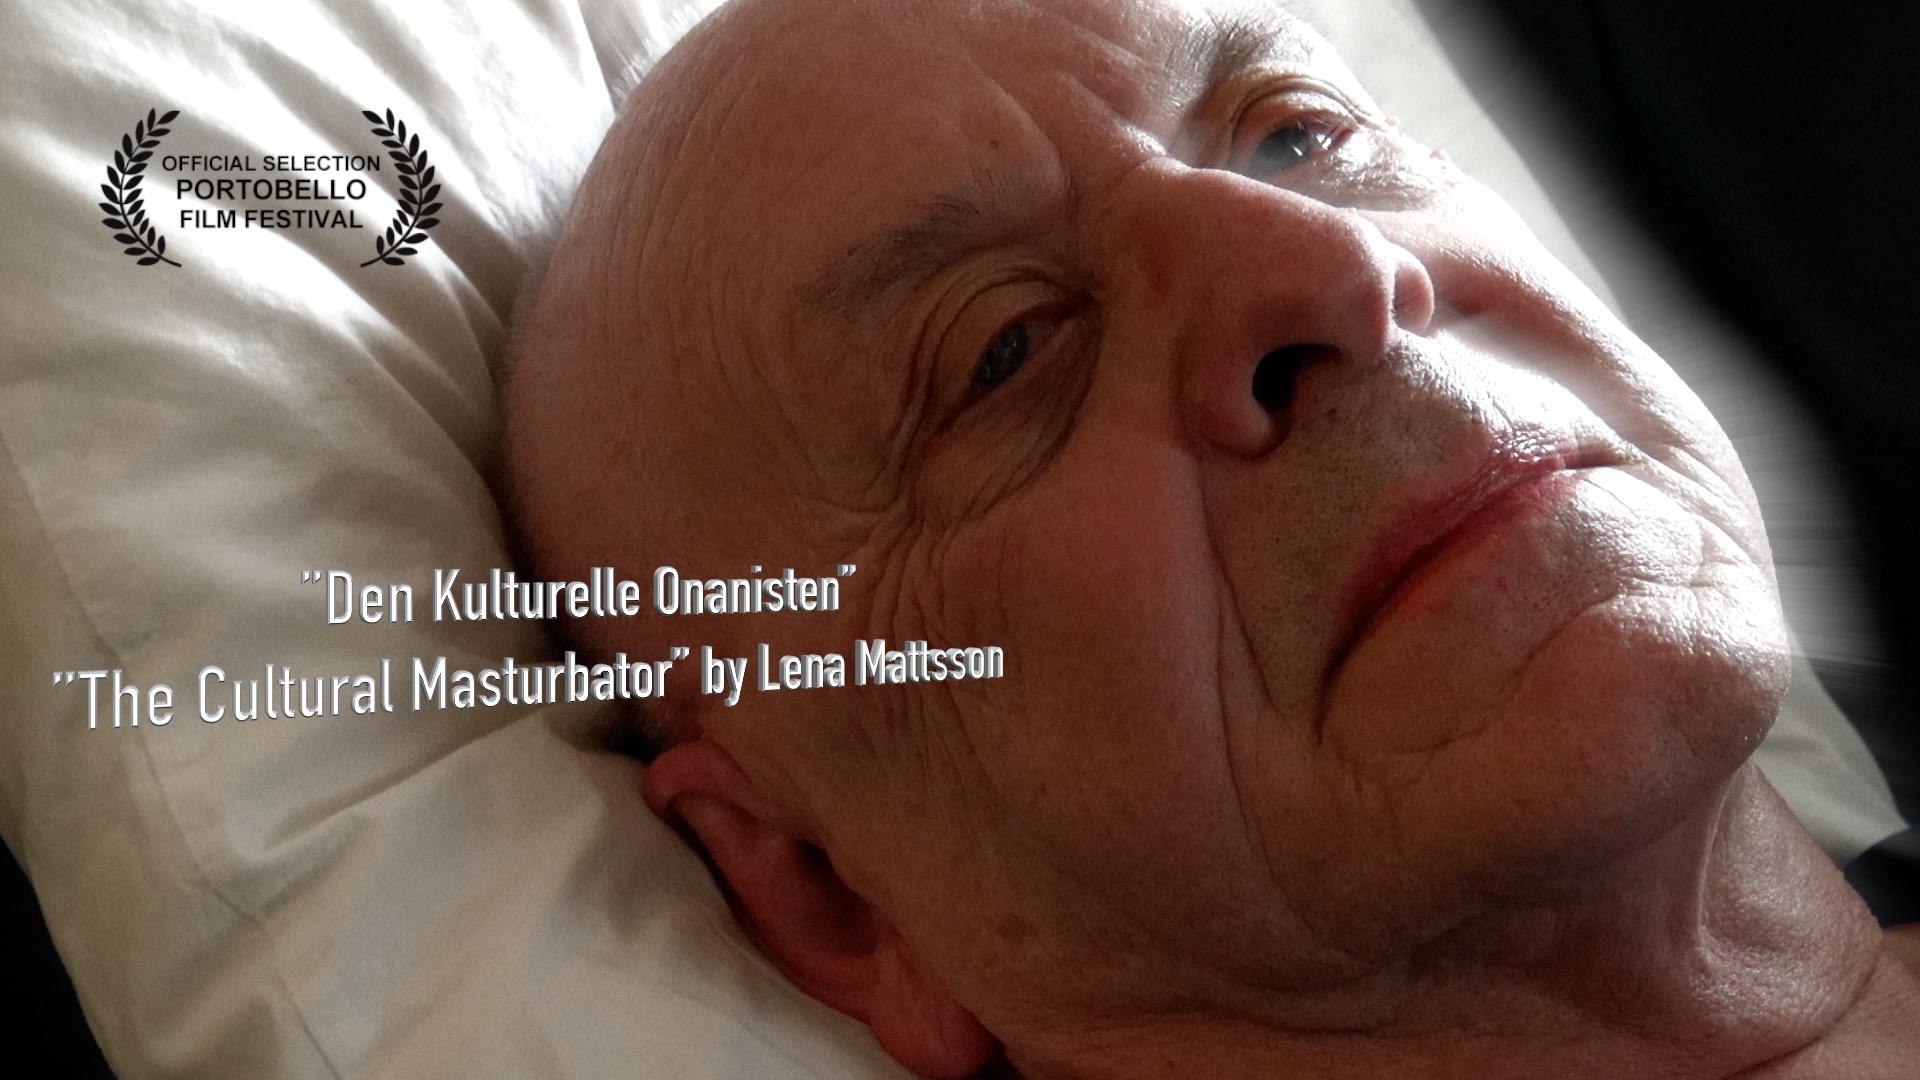 The Cultural Masturbator